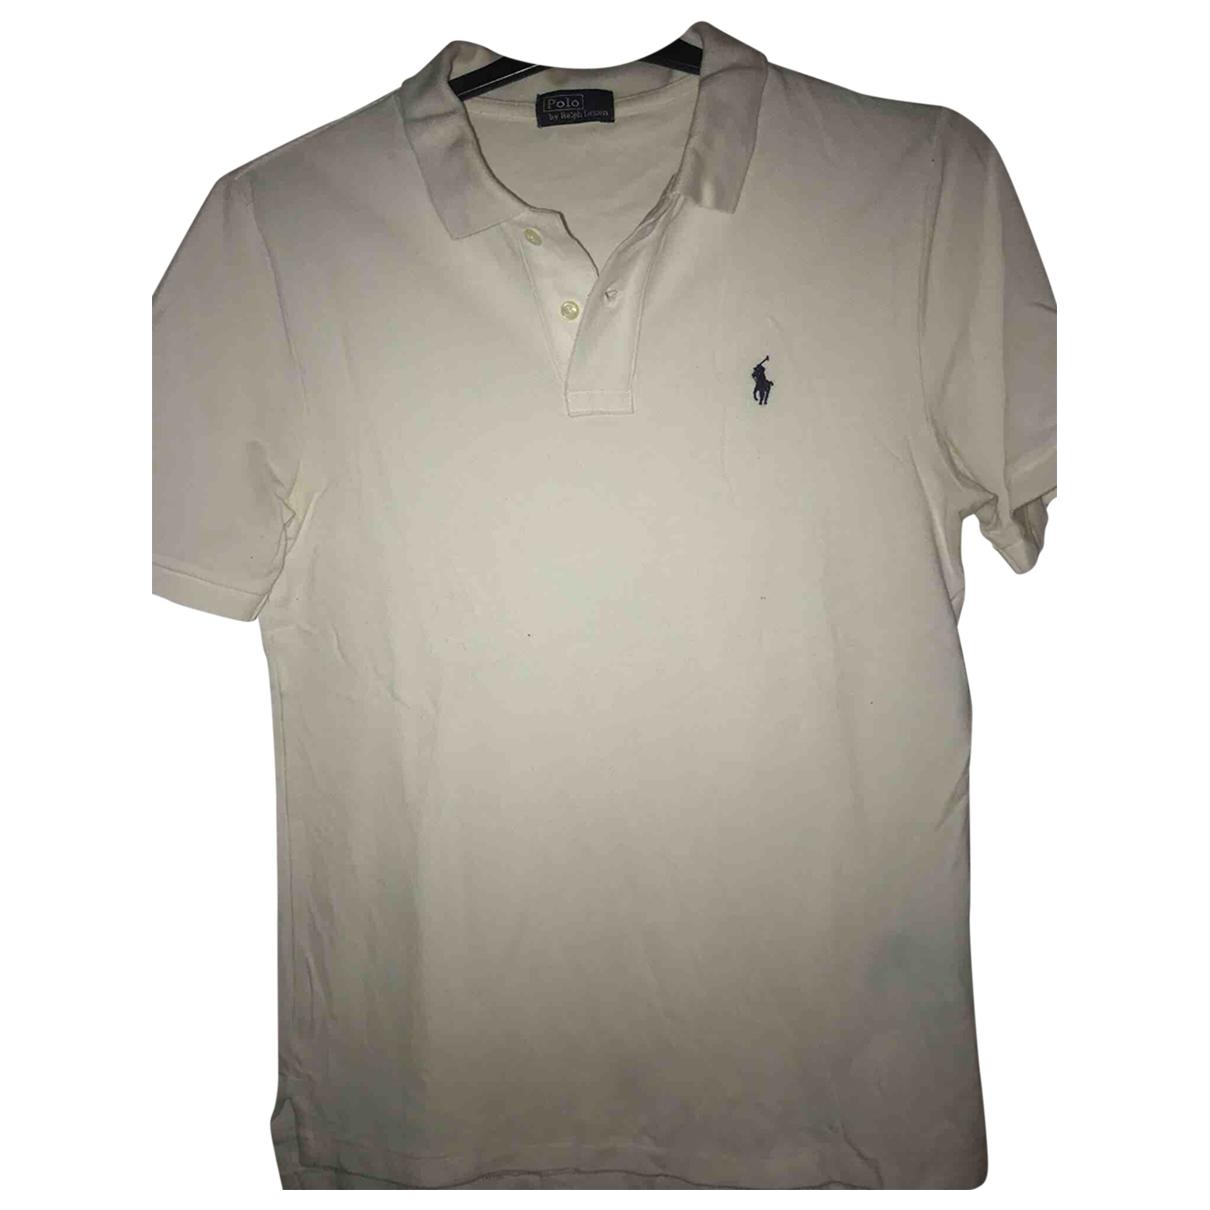 Polo Ralph Lauren - Polos Polo ajuste manches courtes pour homme en coton - blanc